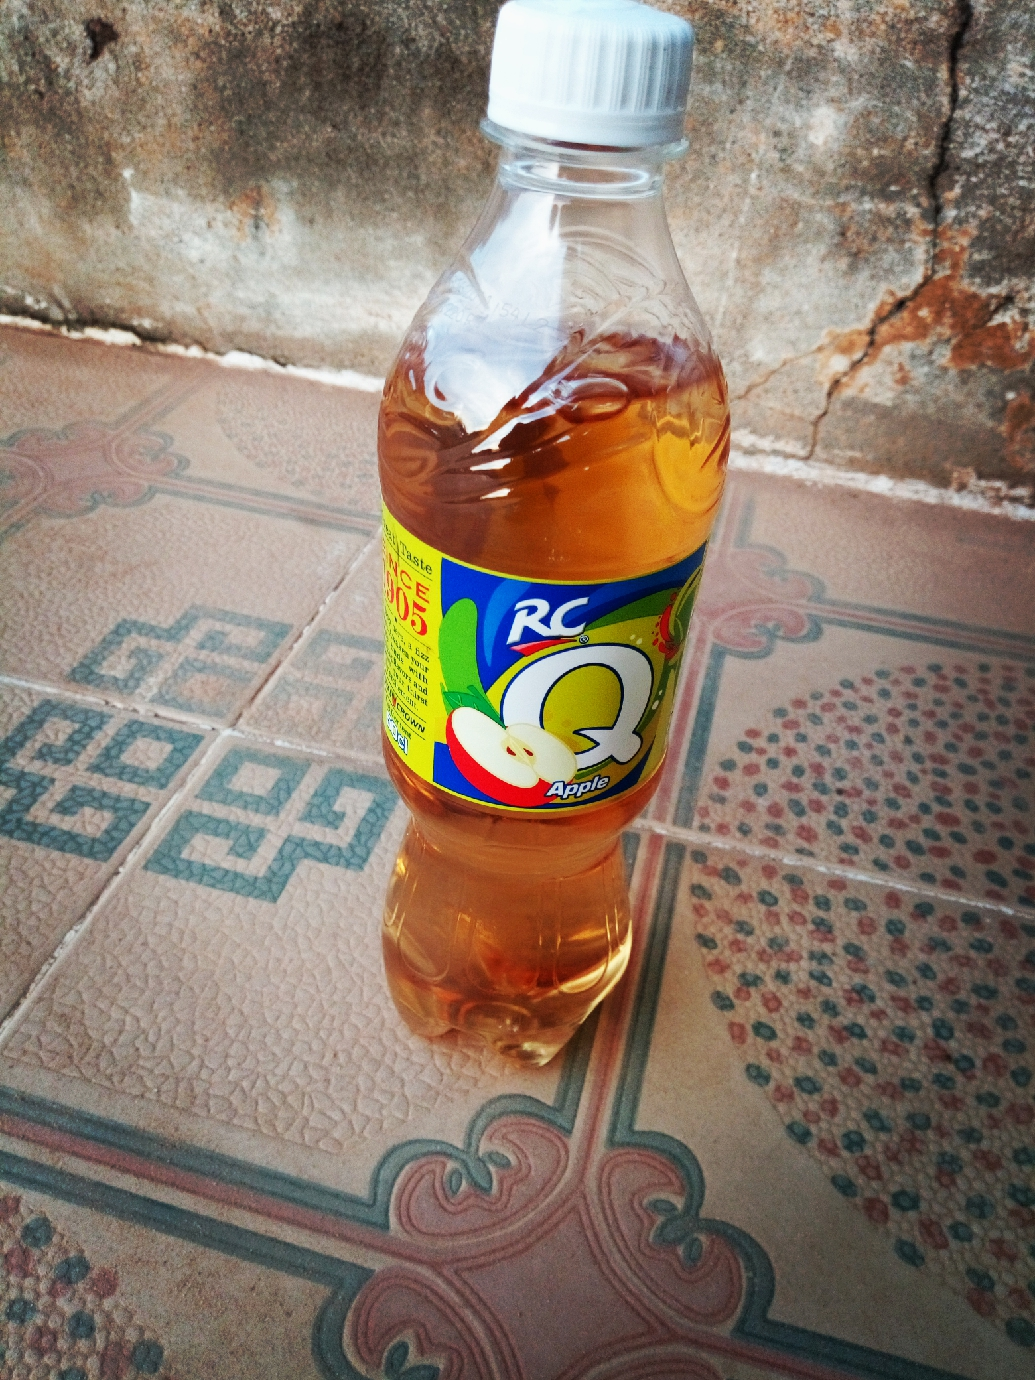 5. RC Apple flavor